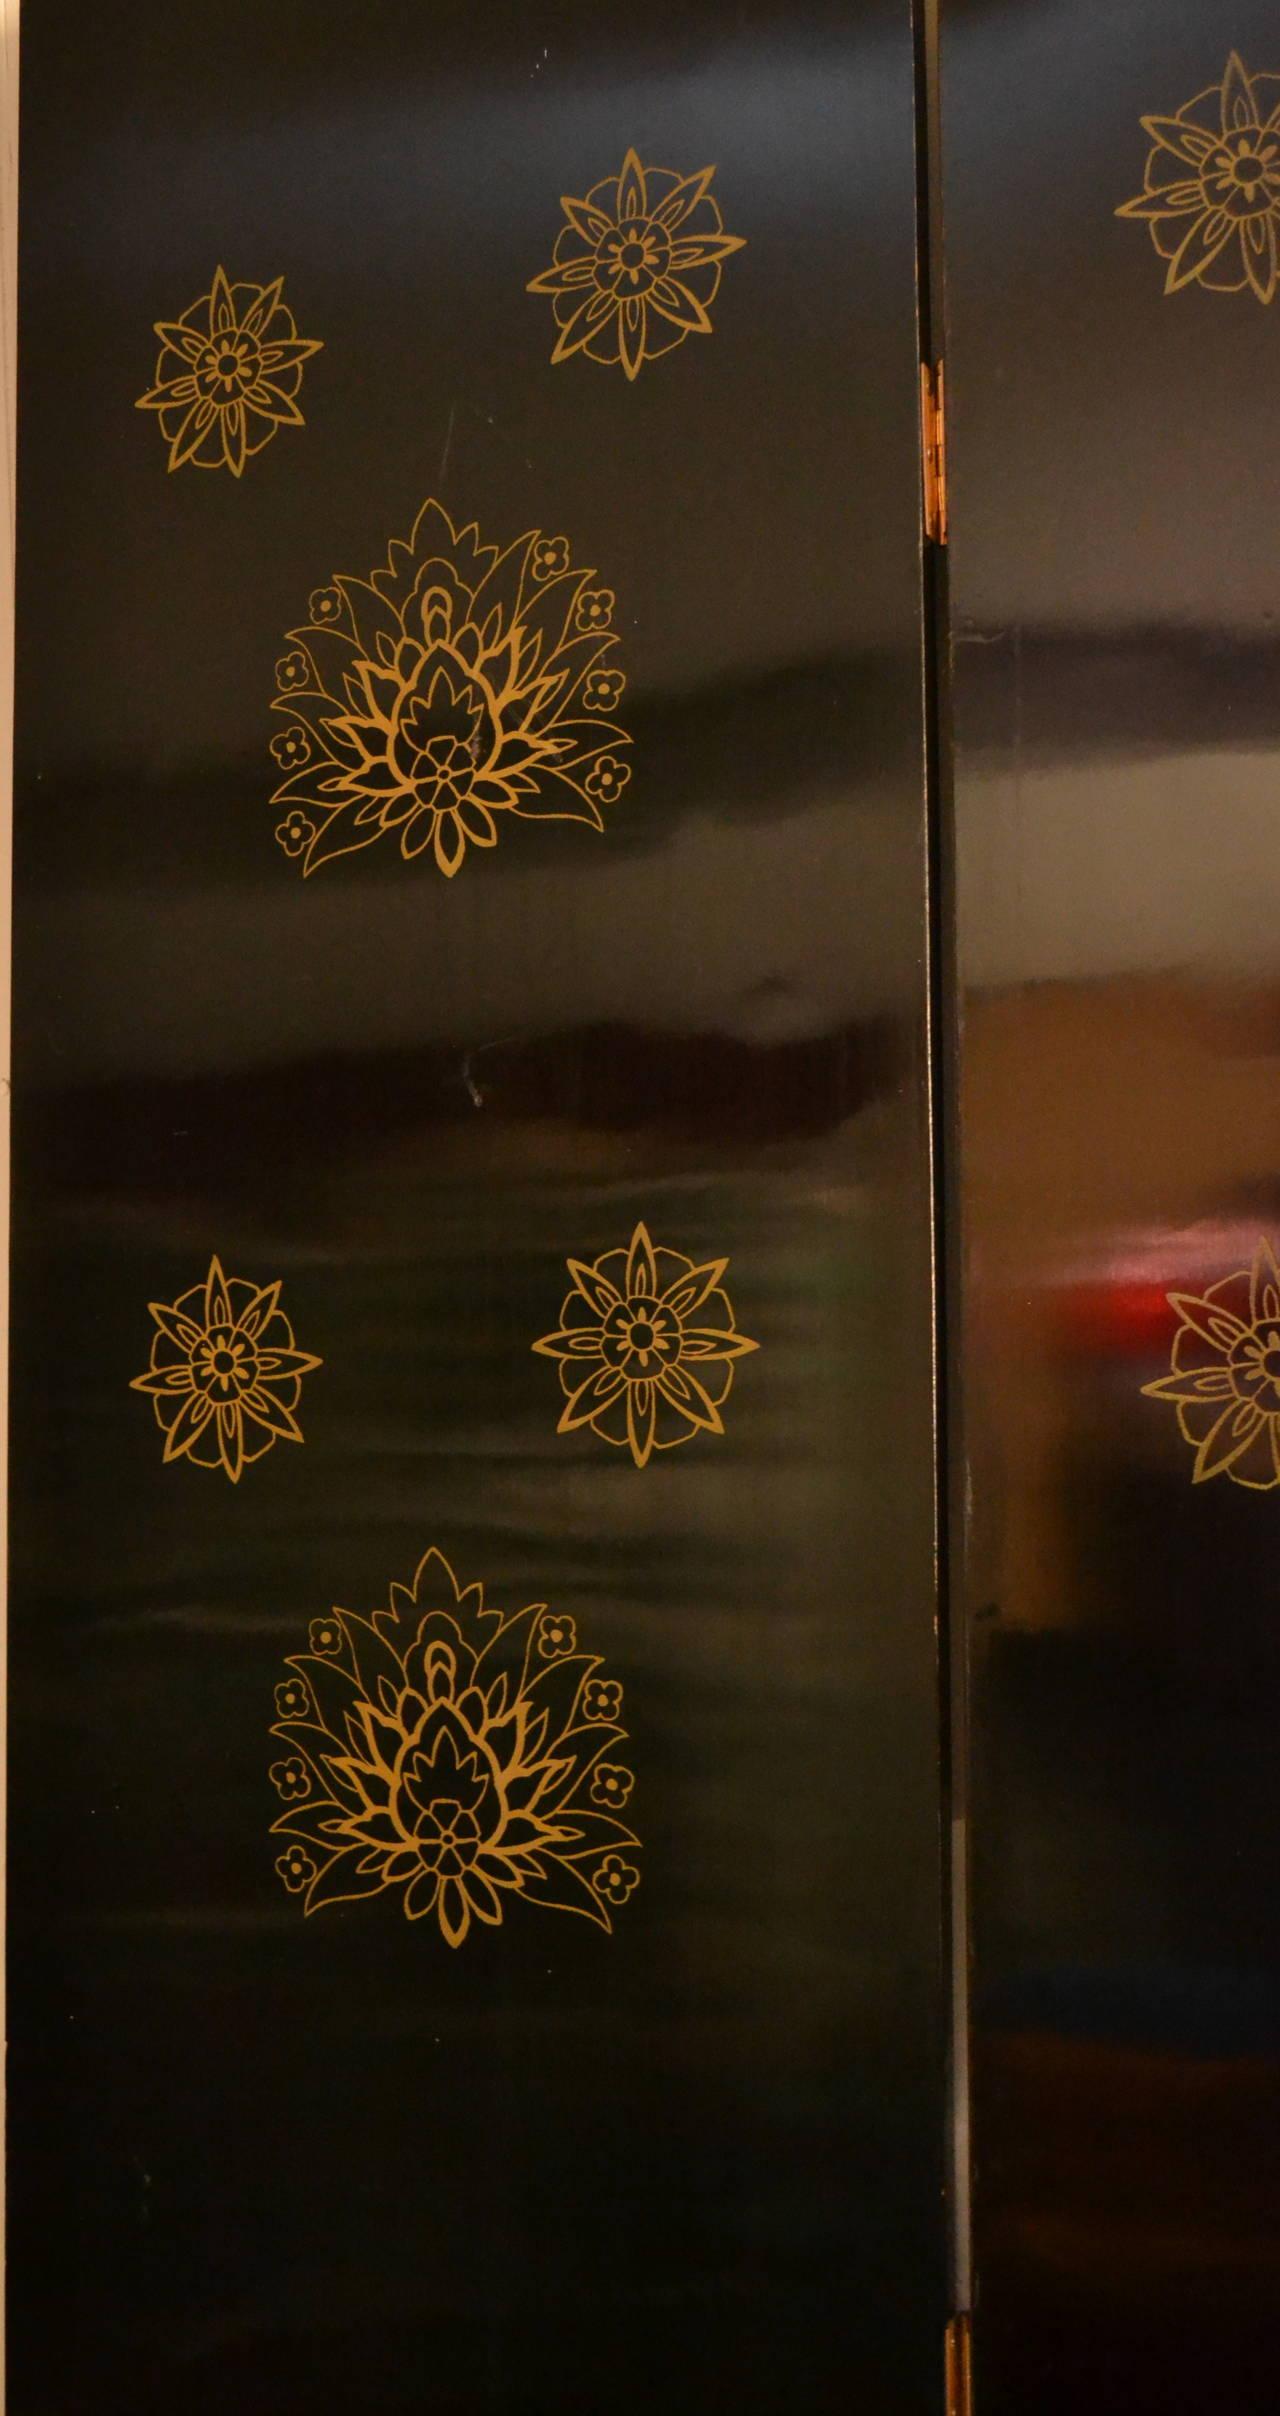 Brass Exquisite Custom Studio Trompe L'oeil Four-Panel Folding Screen For Sale